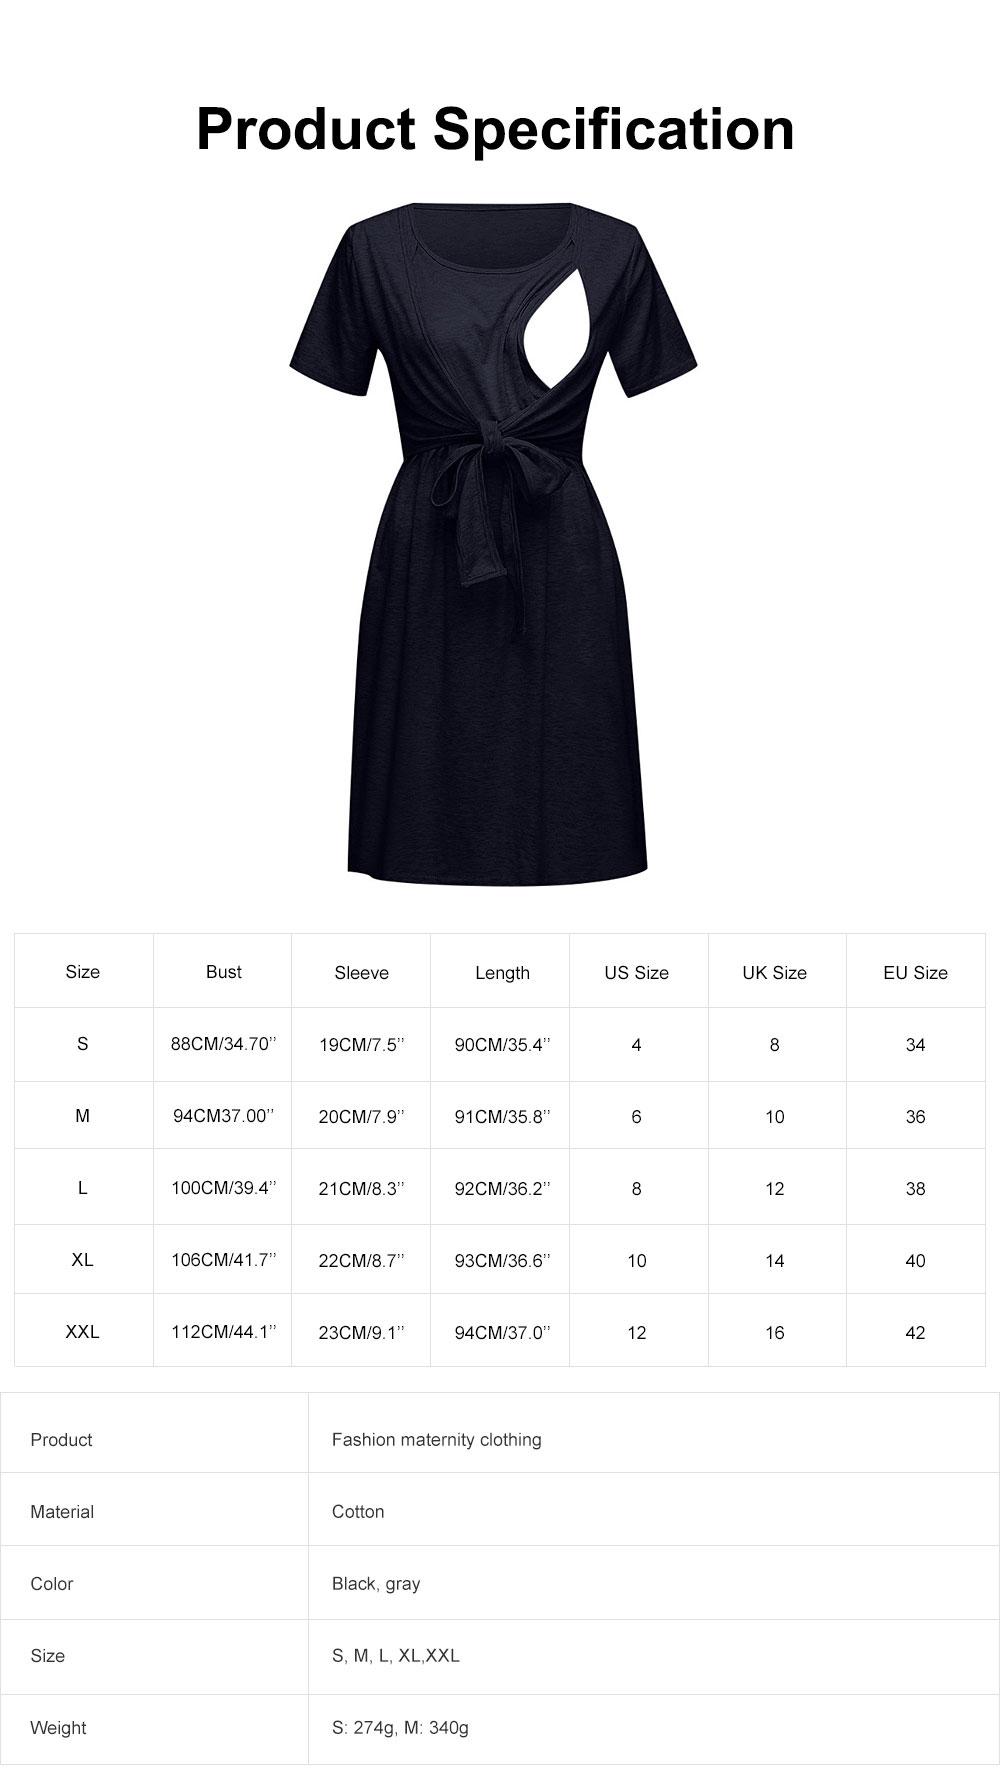 Lady's Nursing Dress Round Neck Soft Cotton Maternity Clothing Dress Fashion 2019 Summer 6